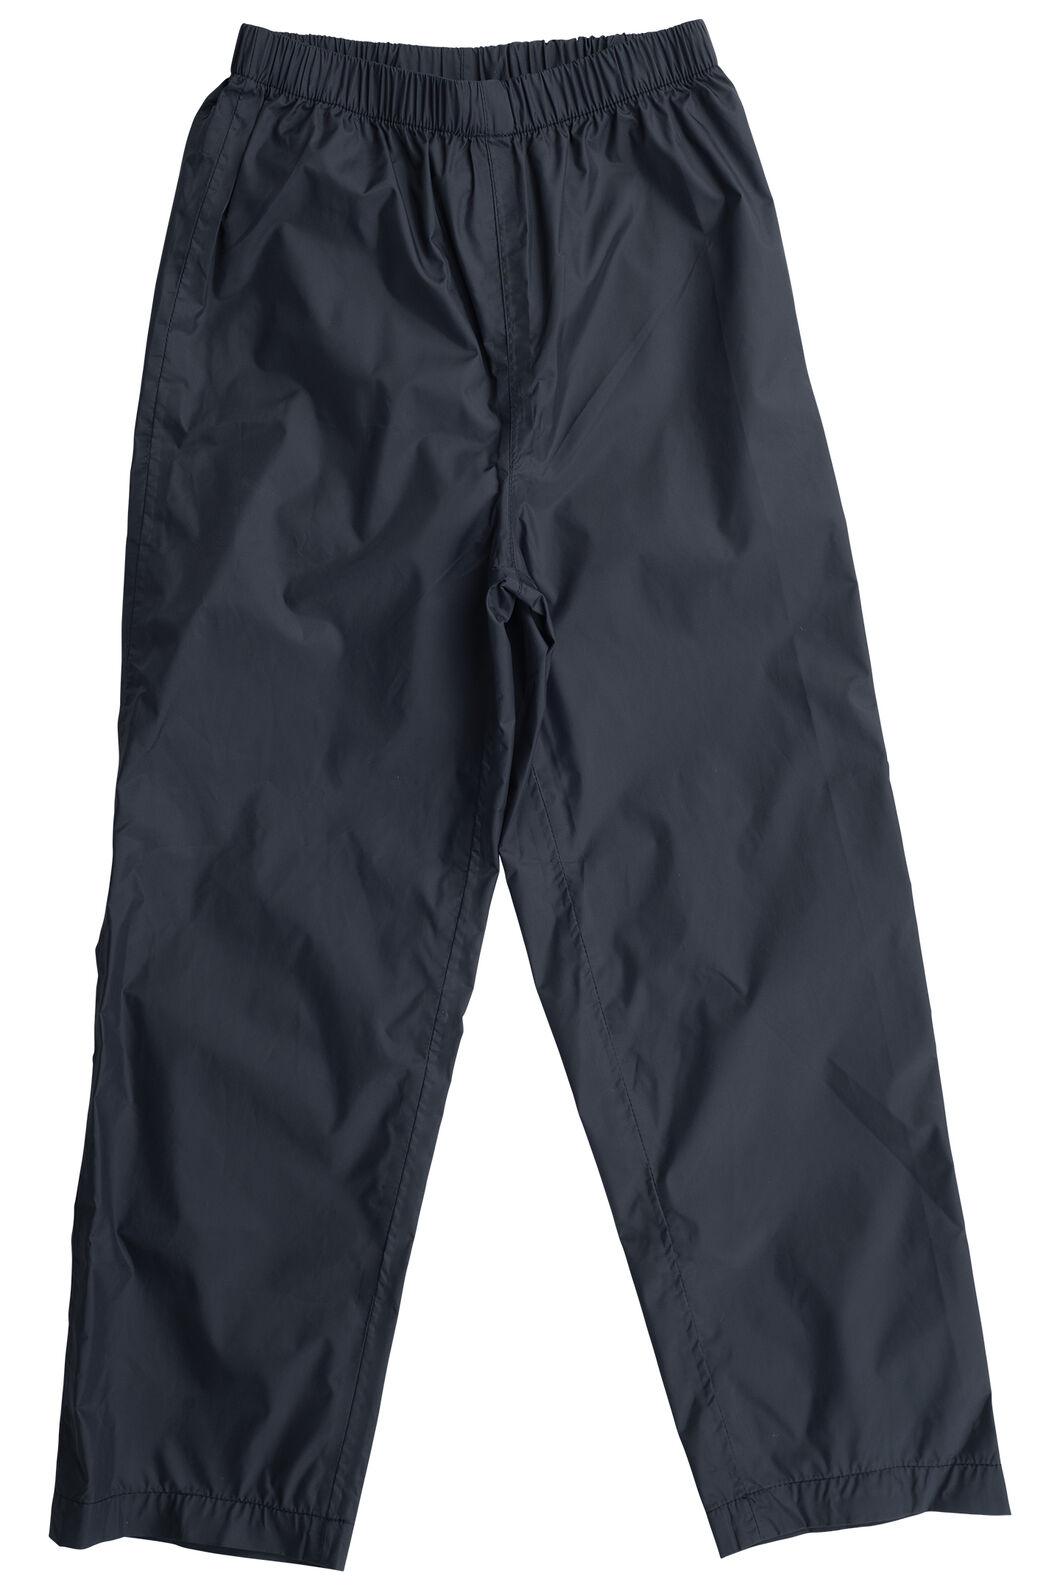 Pack-It-Pant - Kids', Black, hi-res